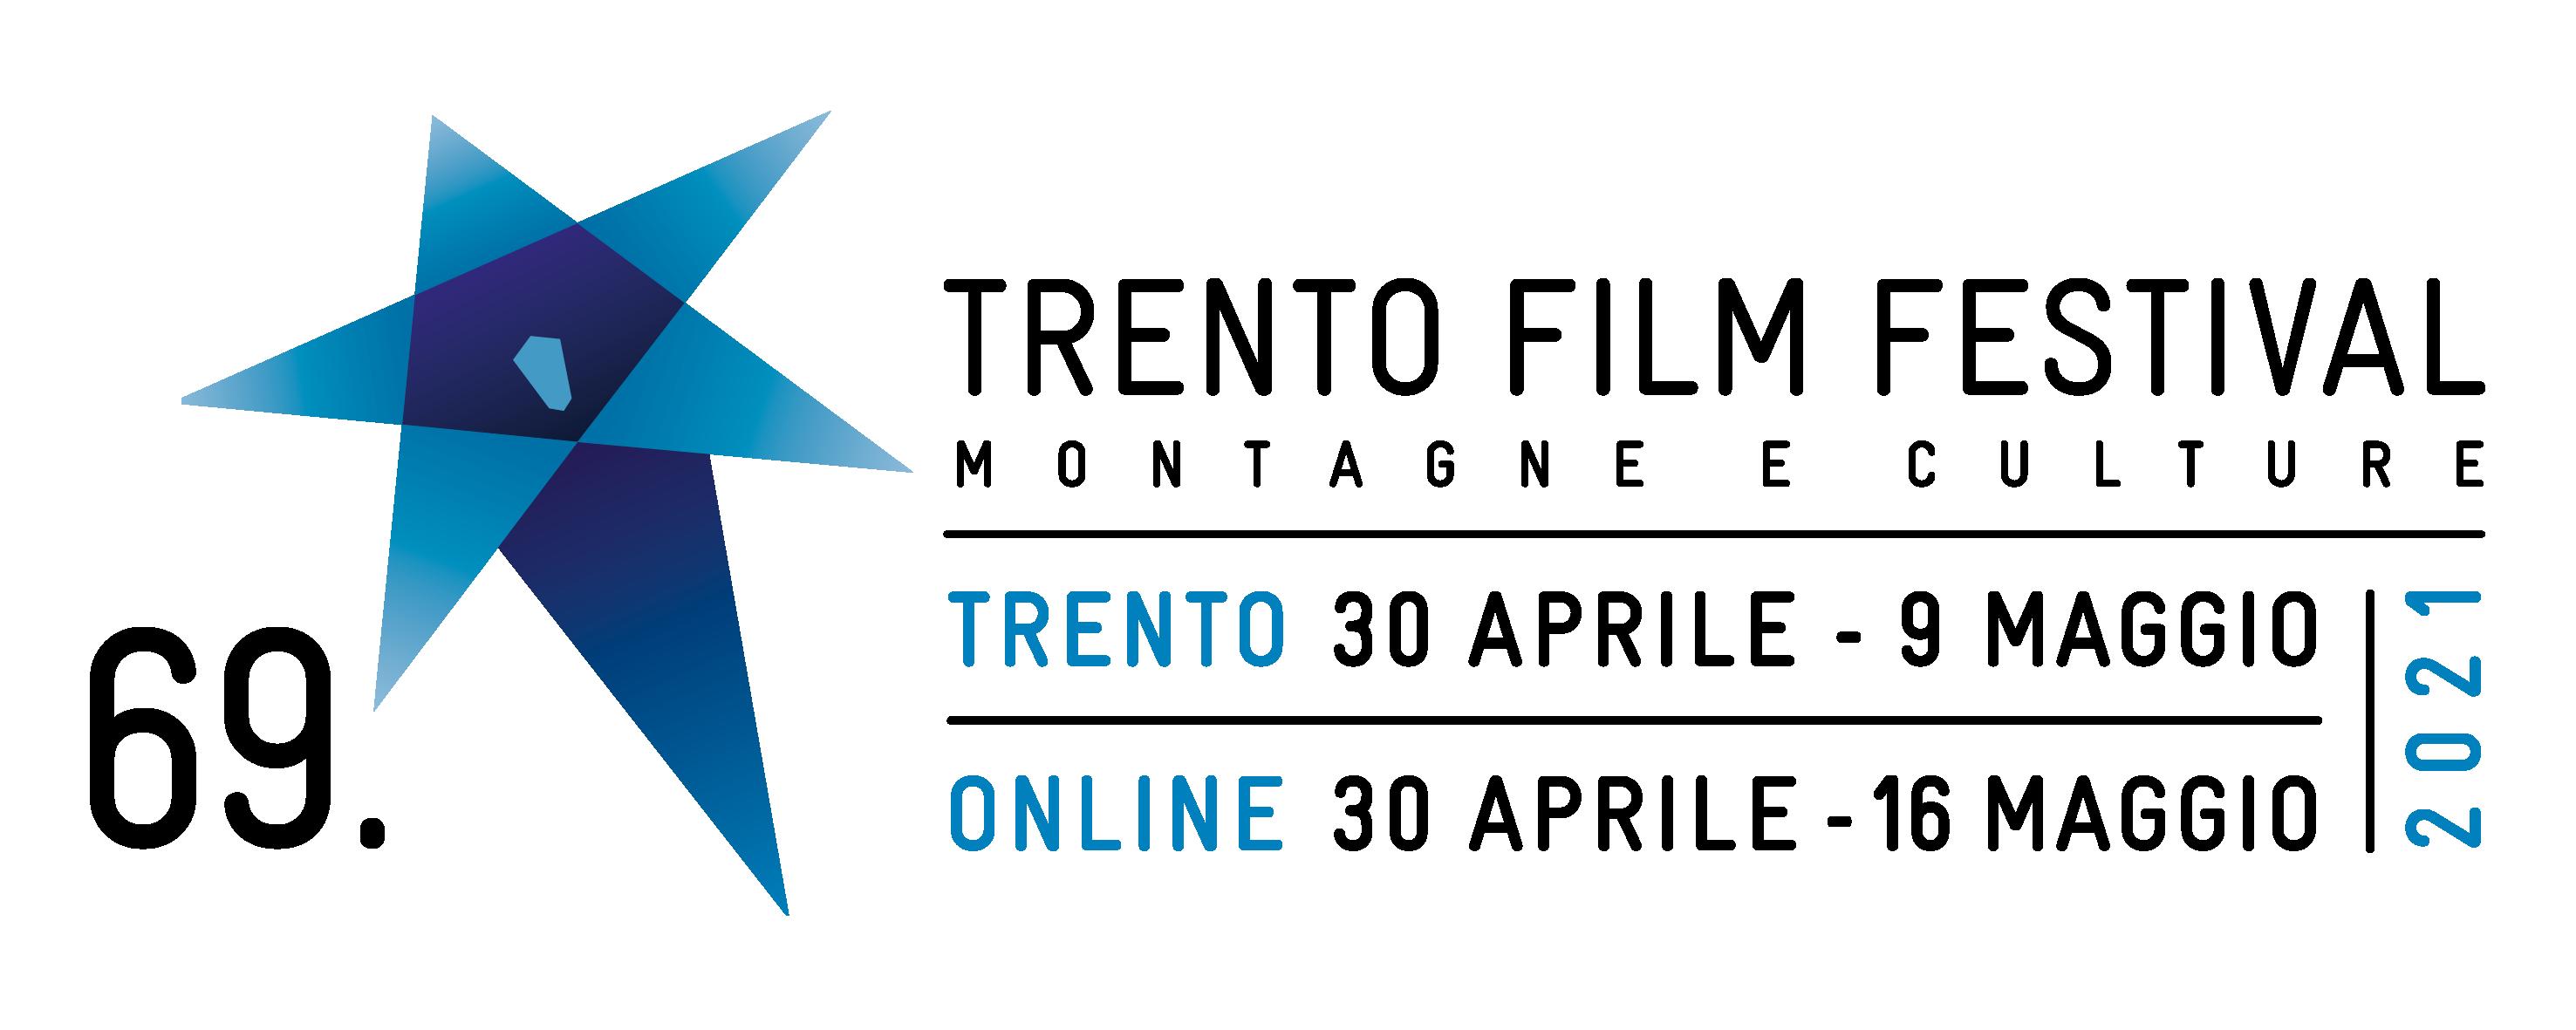 Trento Film Festival 2021